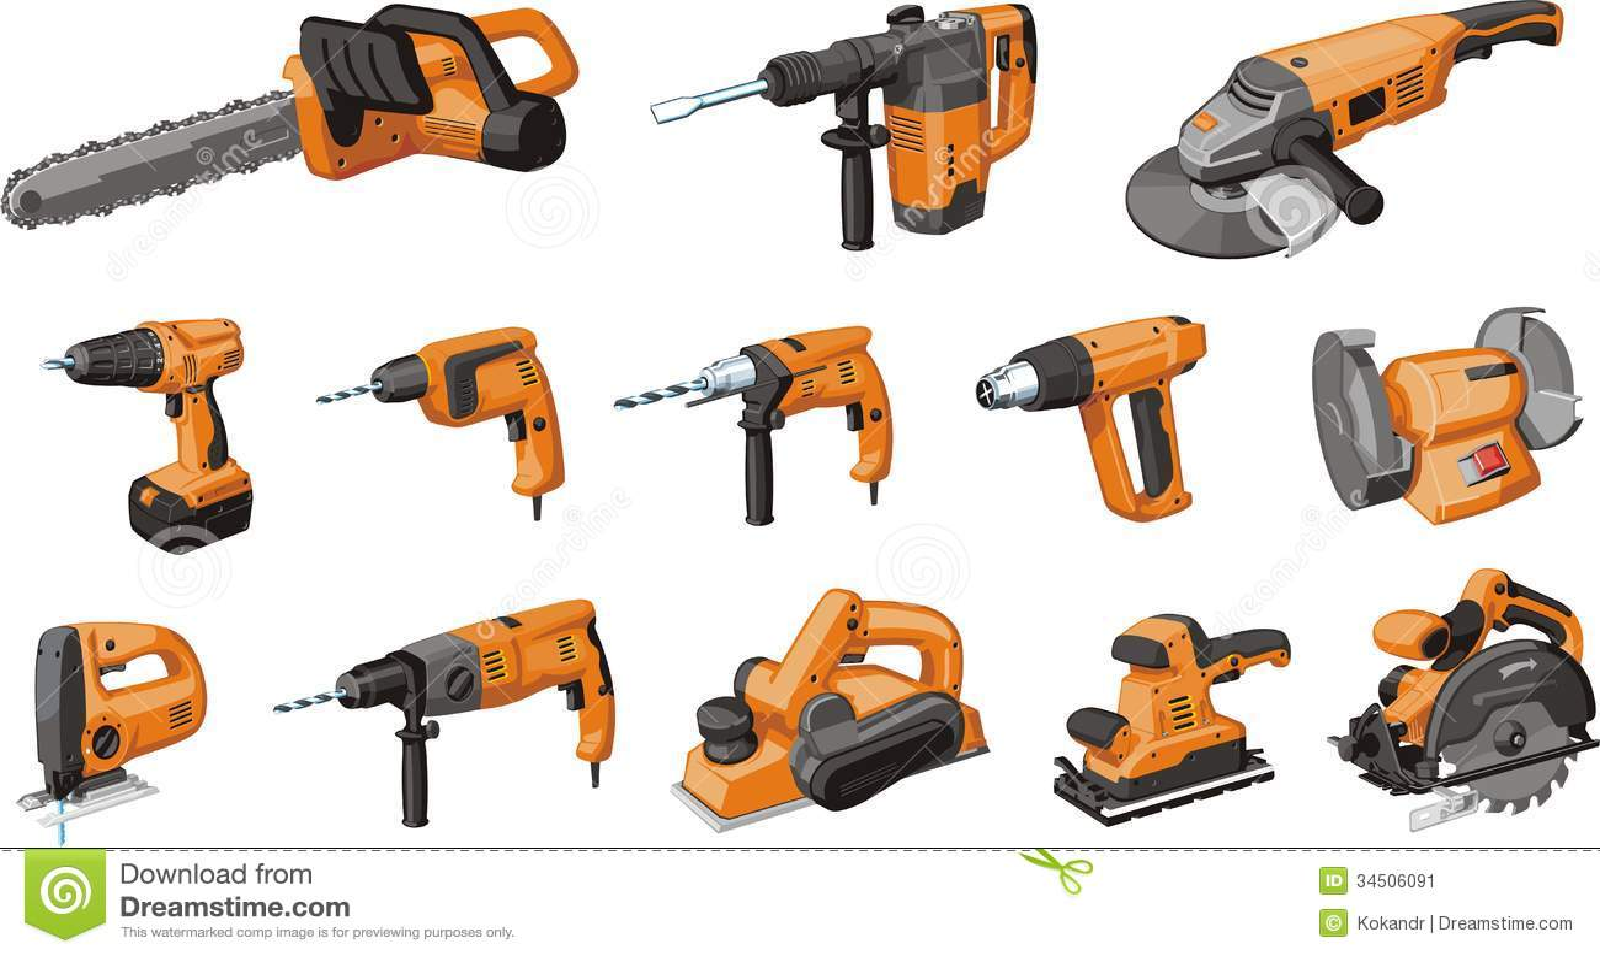 Electricians StraightClaw Hammer Klein Tools 80718